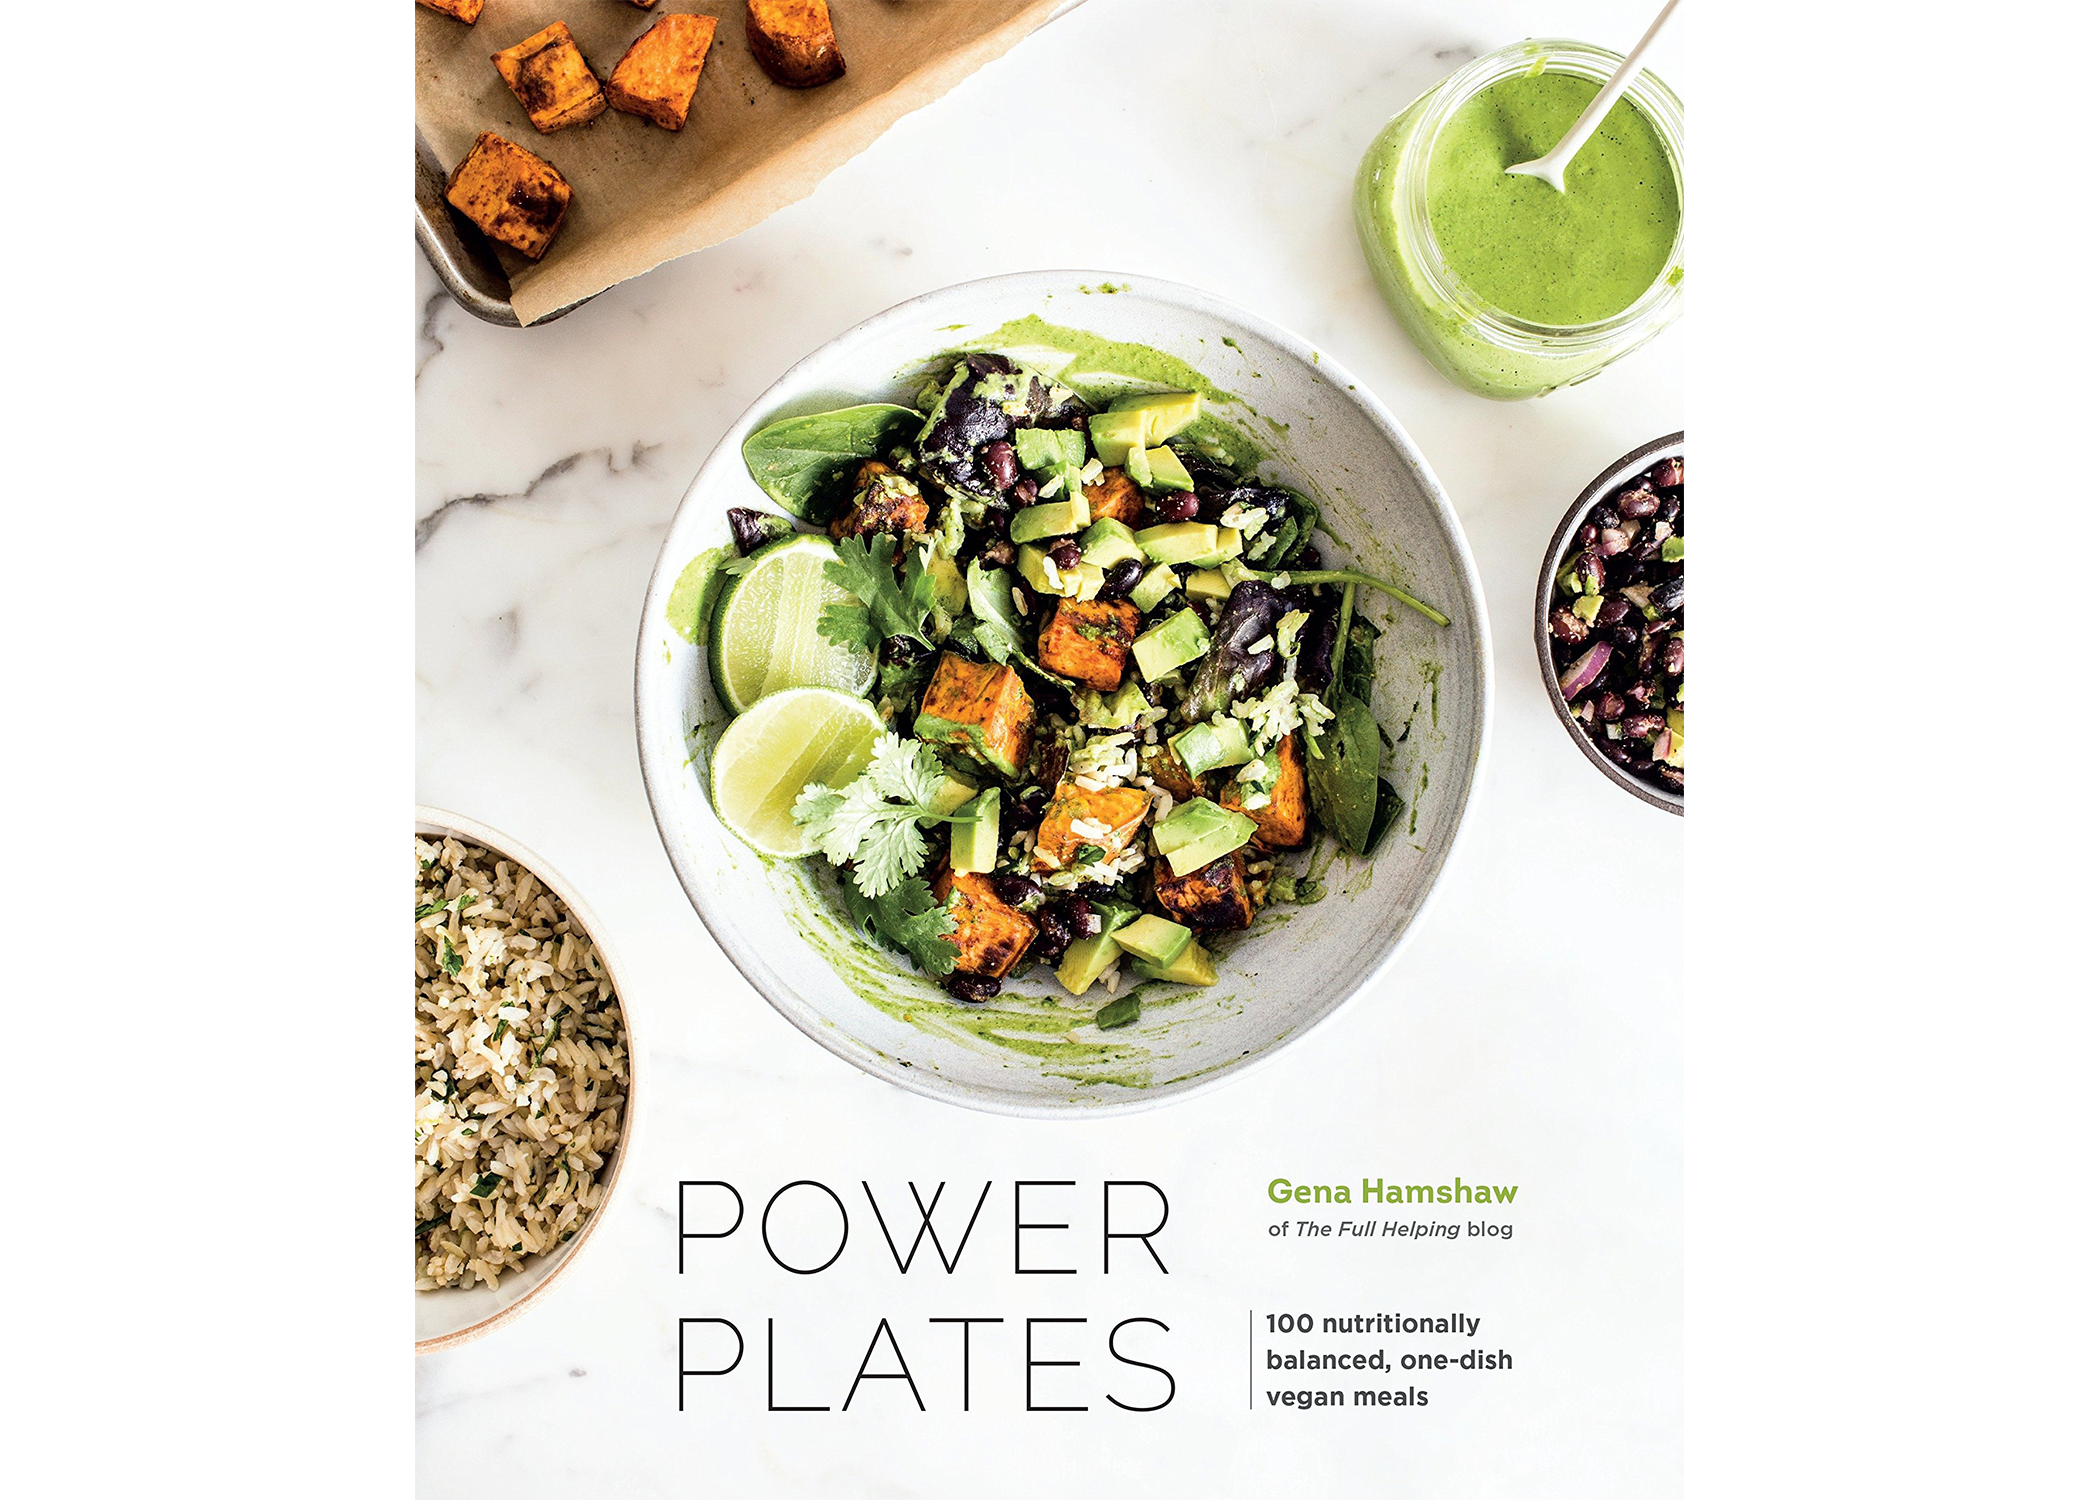 power plates cover.jpg